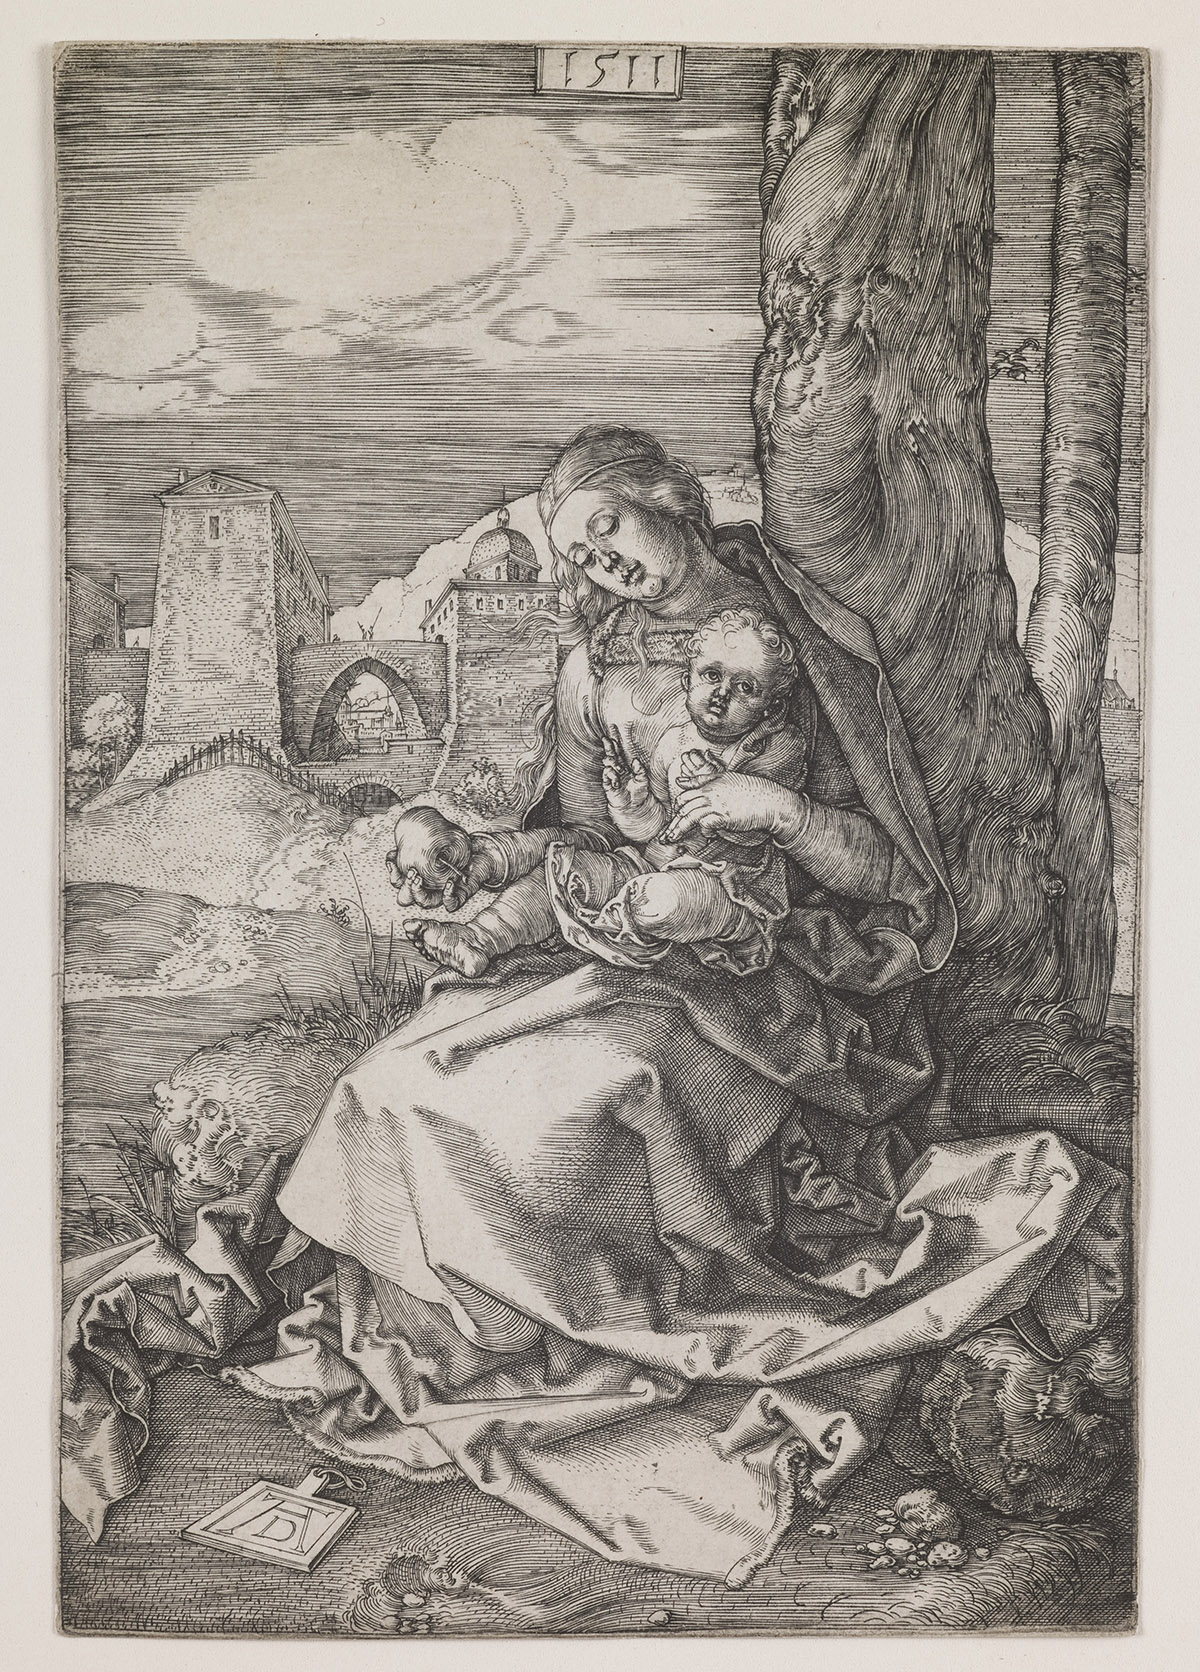 Image credit: Madonna with the Pear, 1511 (engraving), Dürer or Duerer, Albrecht (1471-1528) / Saint Louis Art Museum, Missouri, USA / Museum / Bridgeman Images